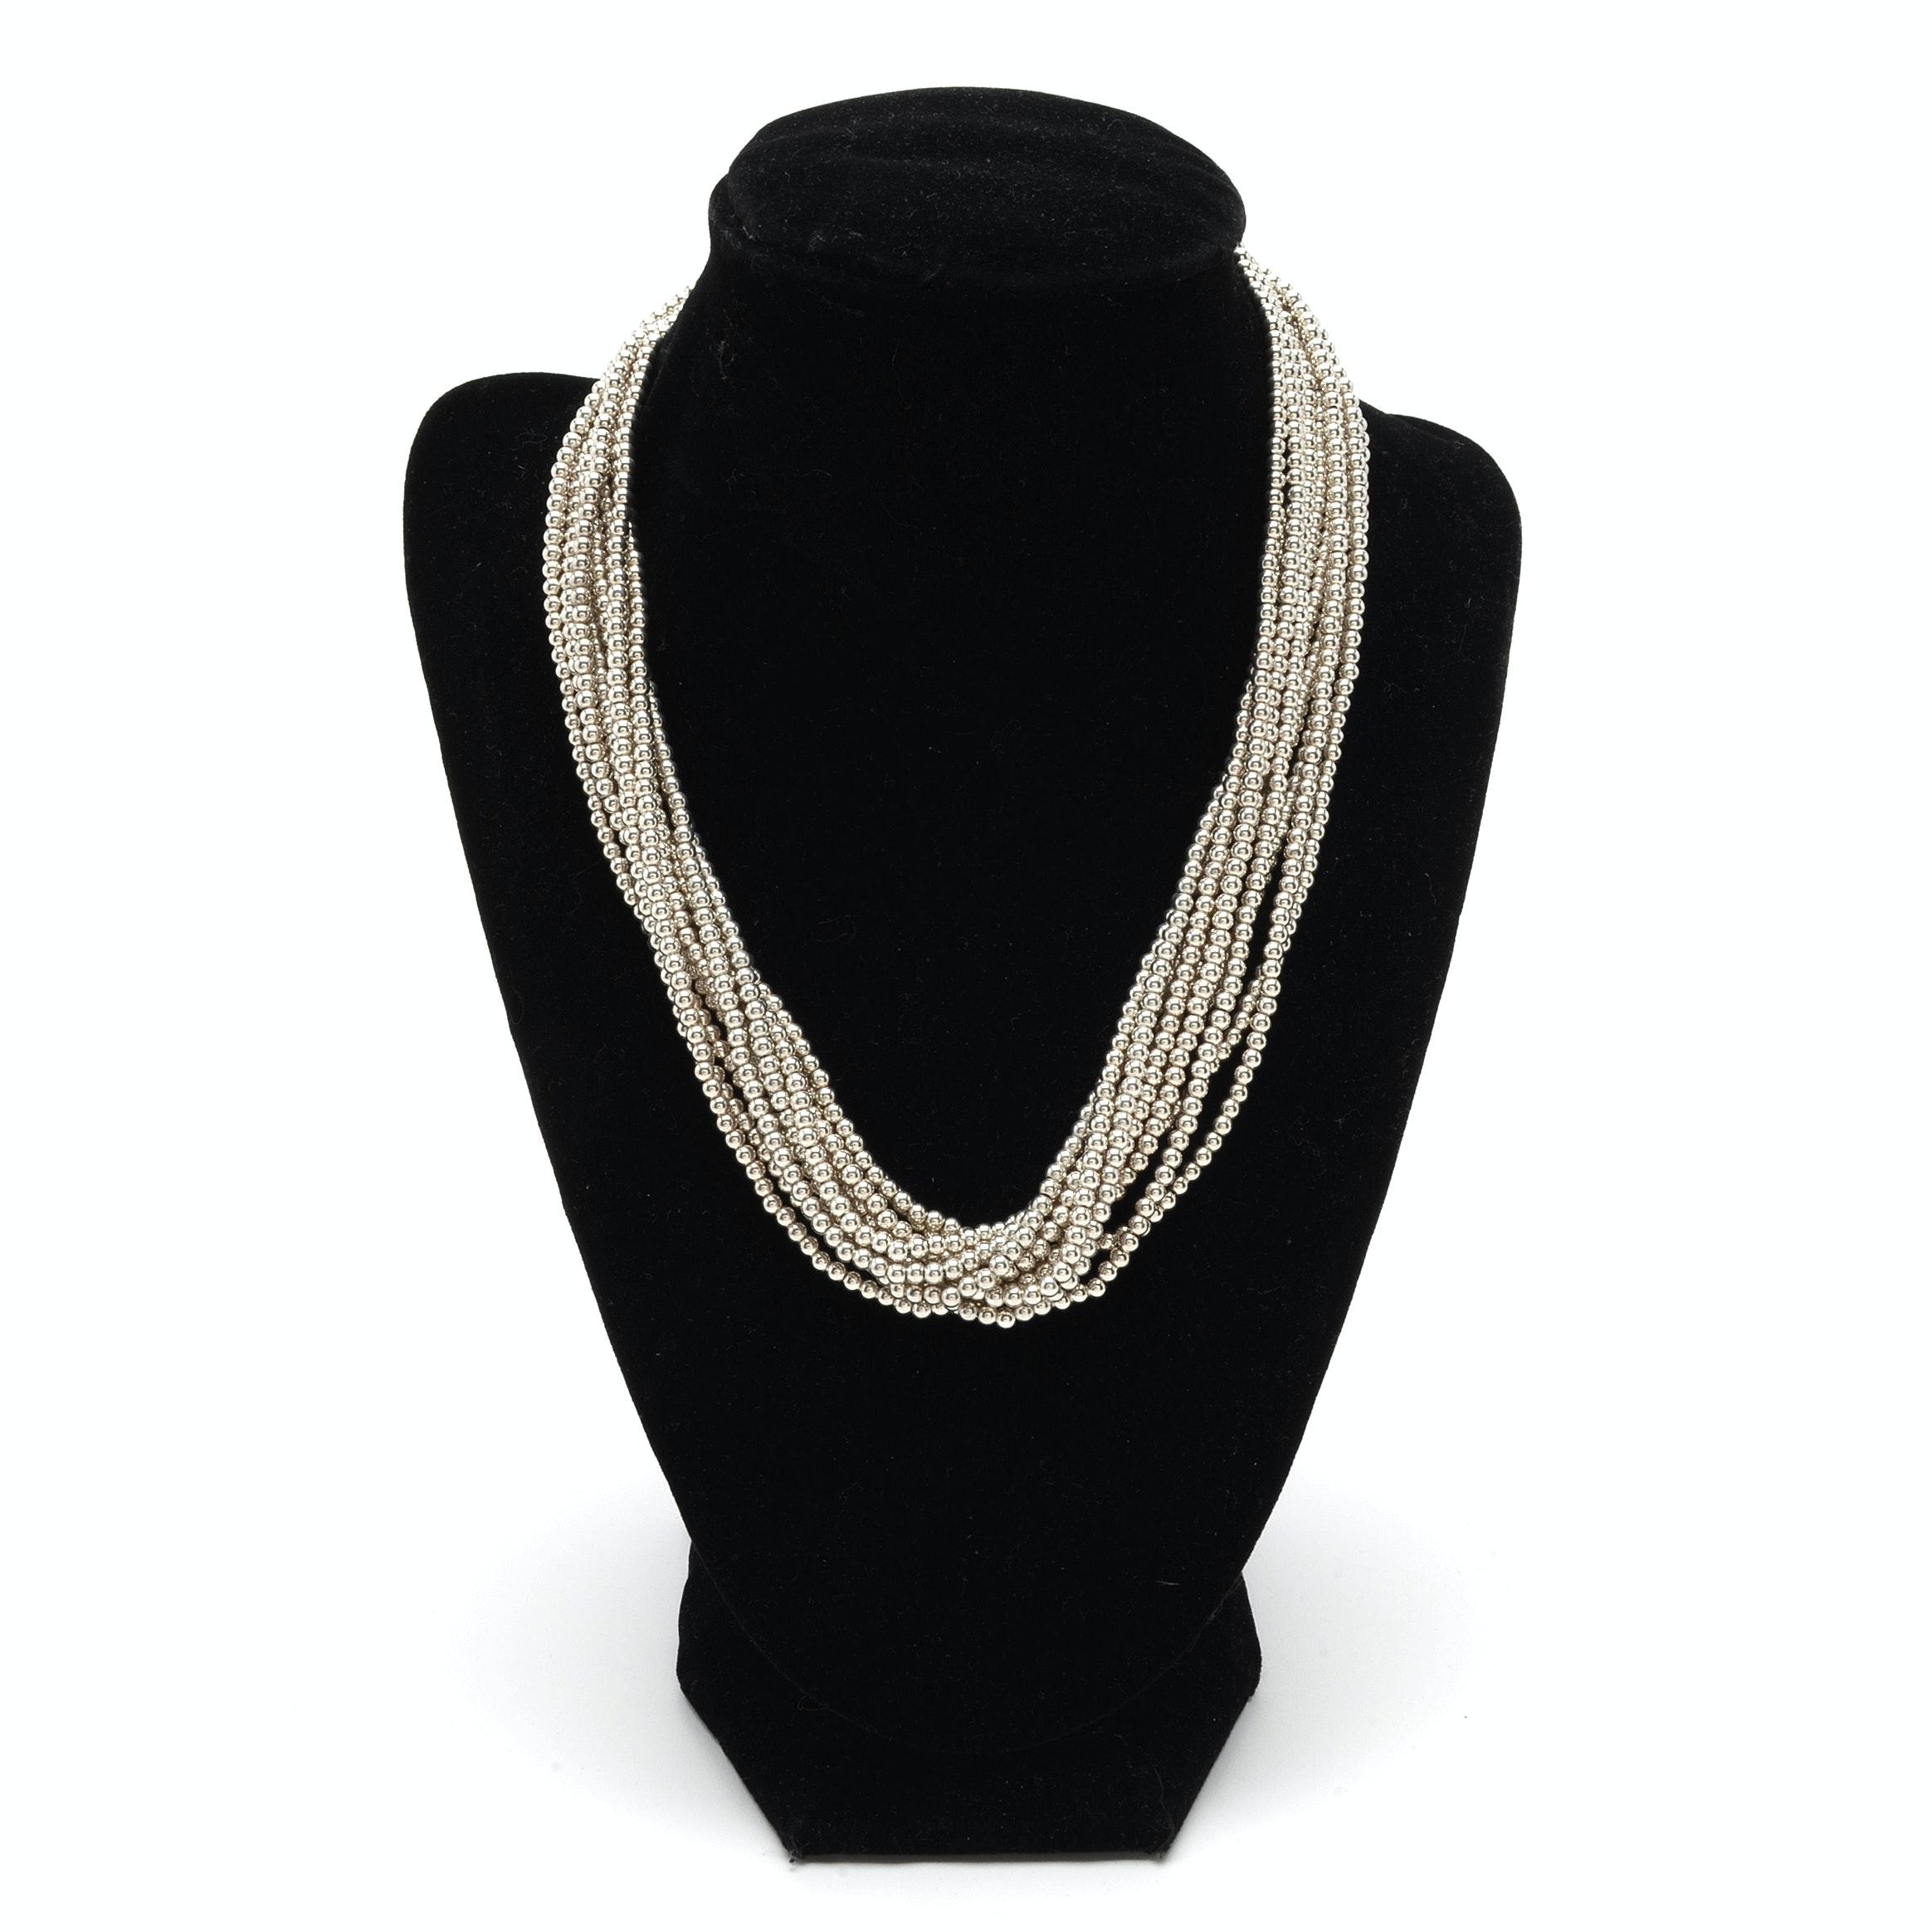 Tiffany & Co. Sterling Silver Ten-Strand Torsade Necklace